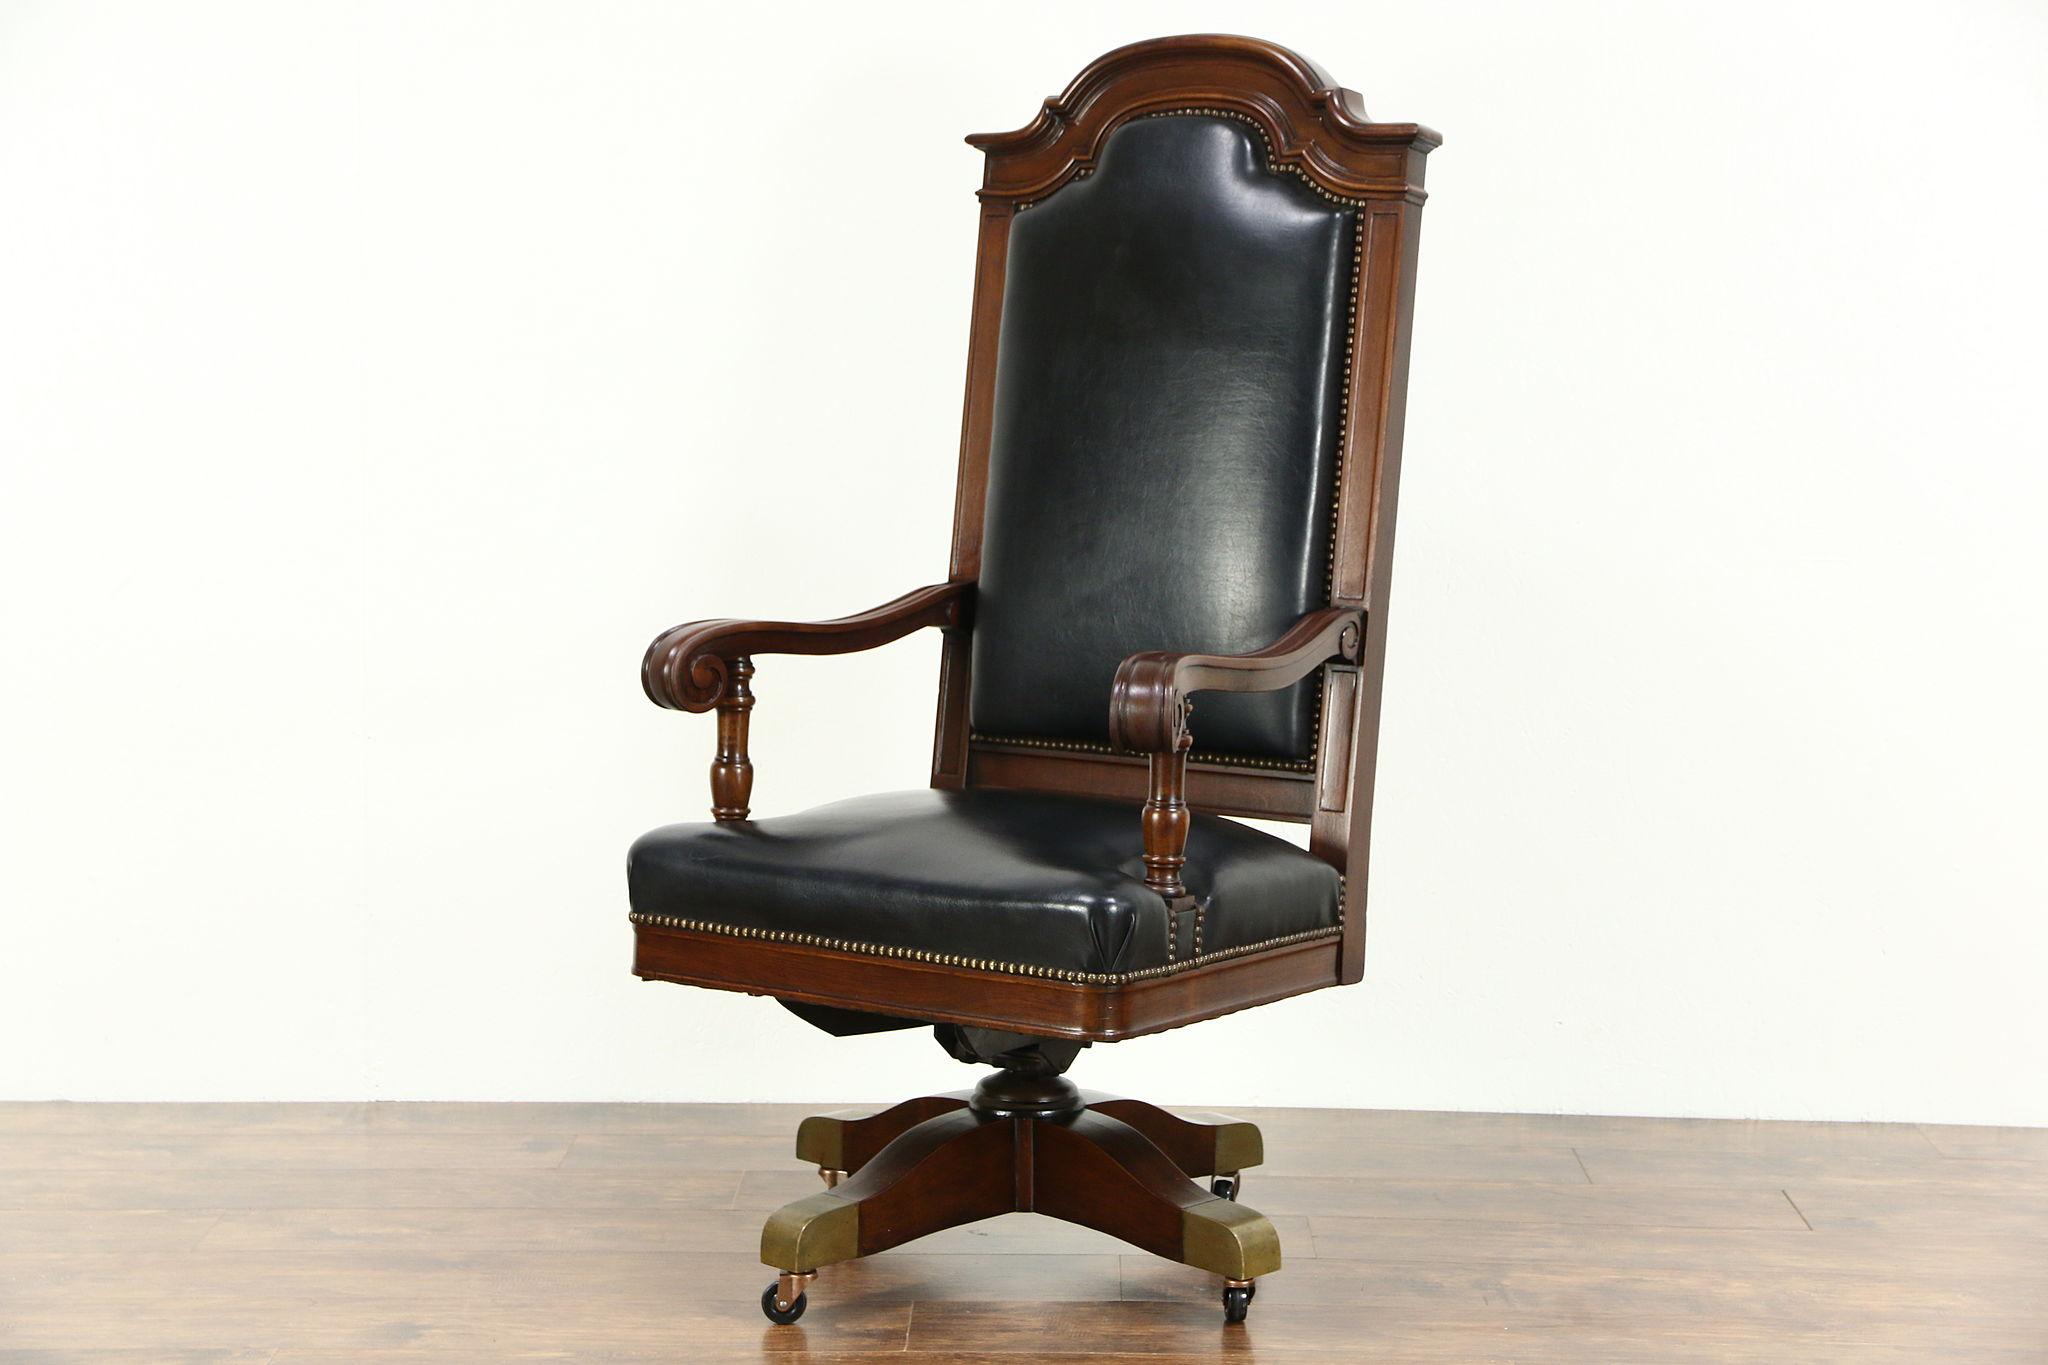 SOLD Judge Swivel 1915 Antique Walnut Leather Desk